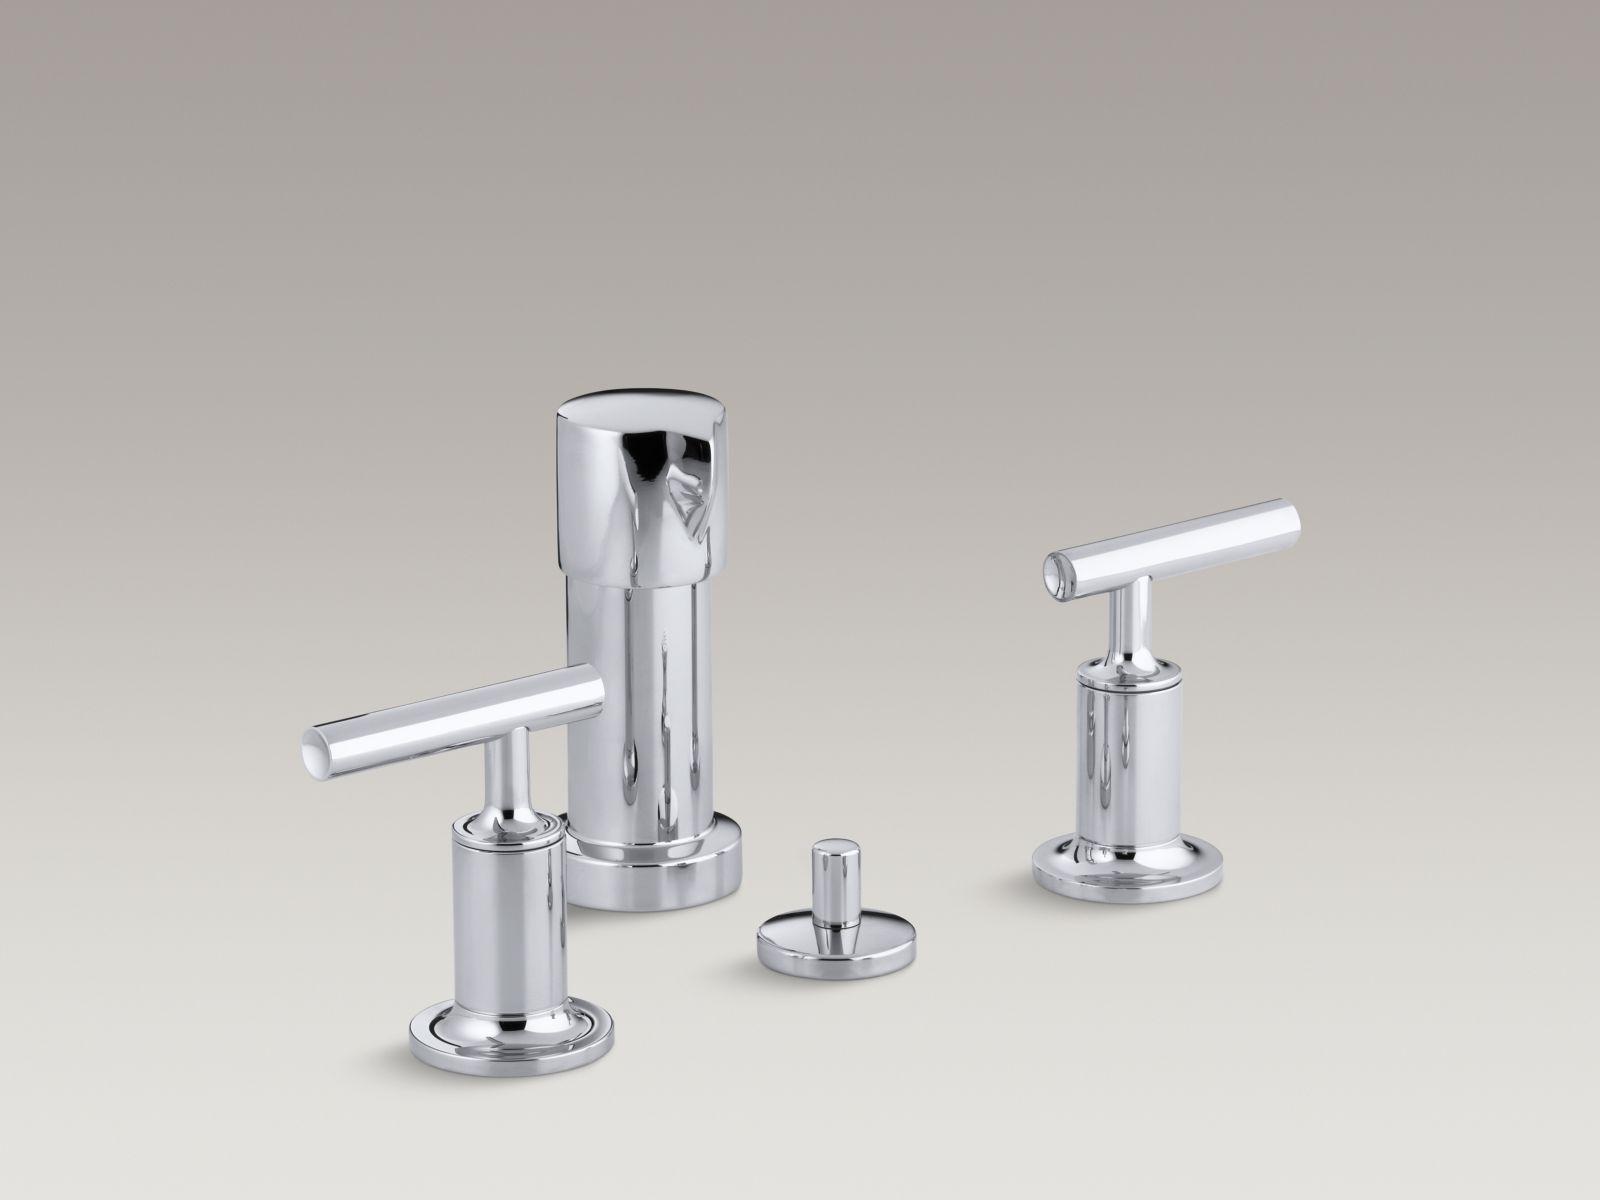 Kohler K-14431-4-CP Purist Vertical Spray Bidet Faucet with Lever Handles Polished Chrome